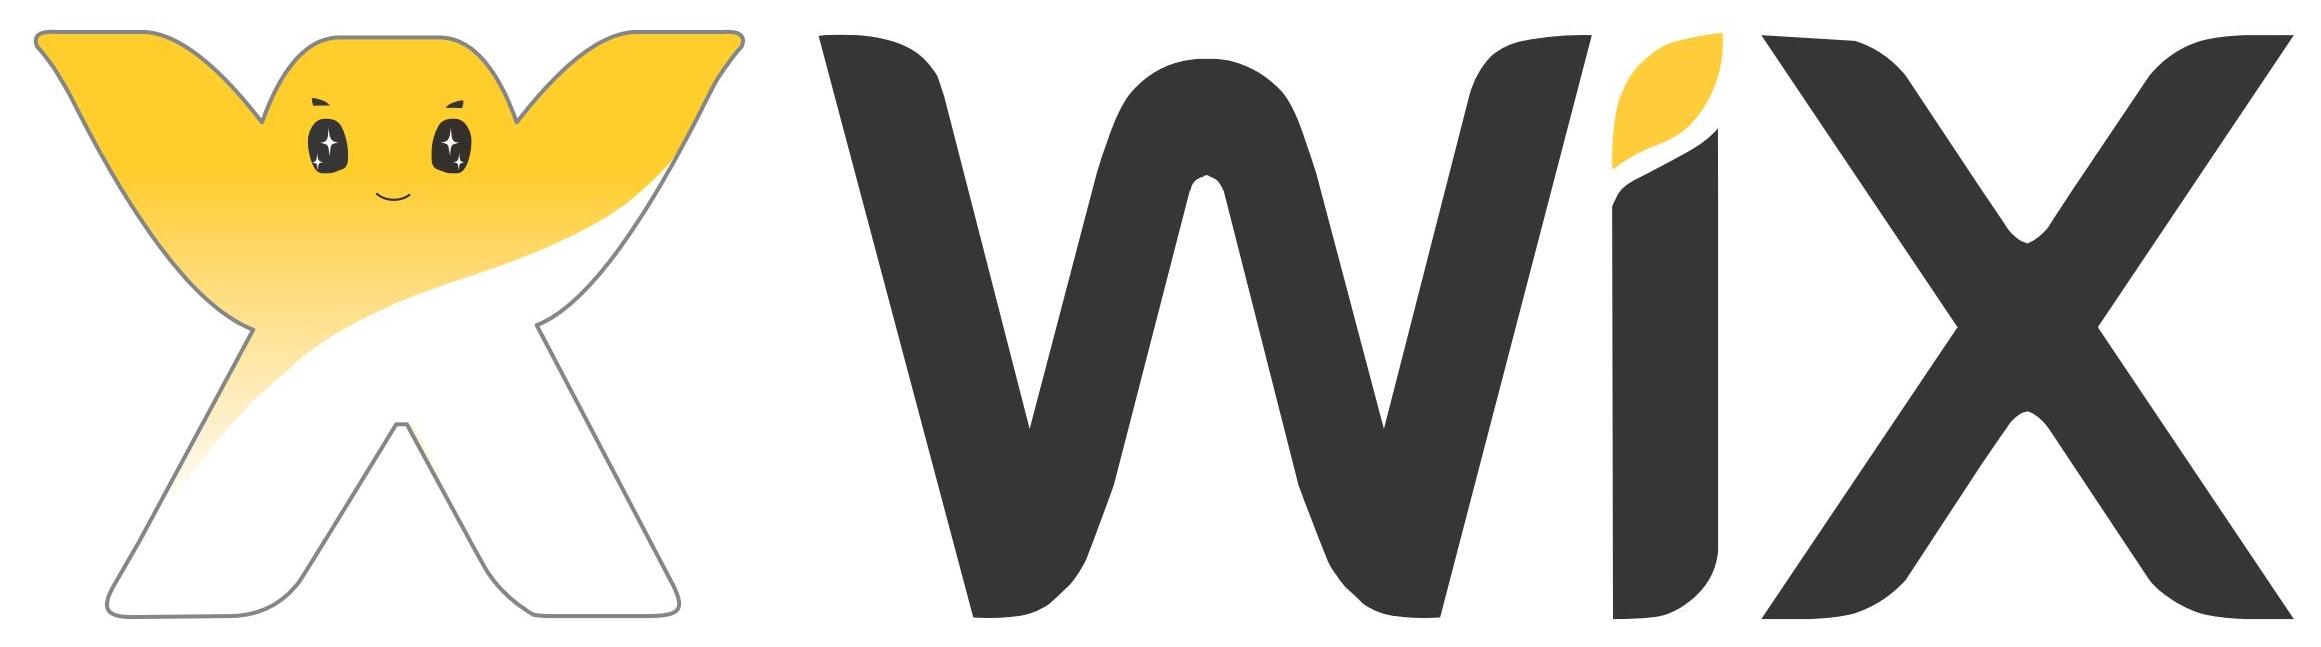 Wix - Web Design - Web Development - VA Web Design